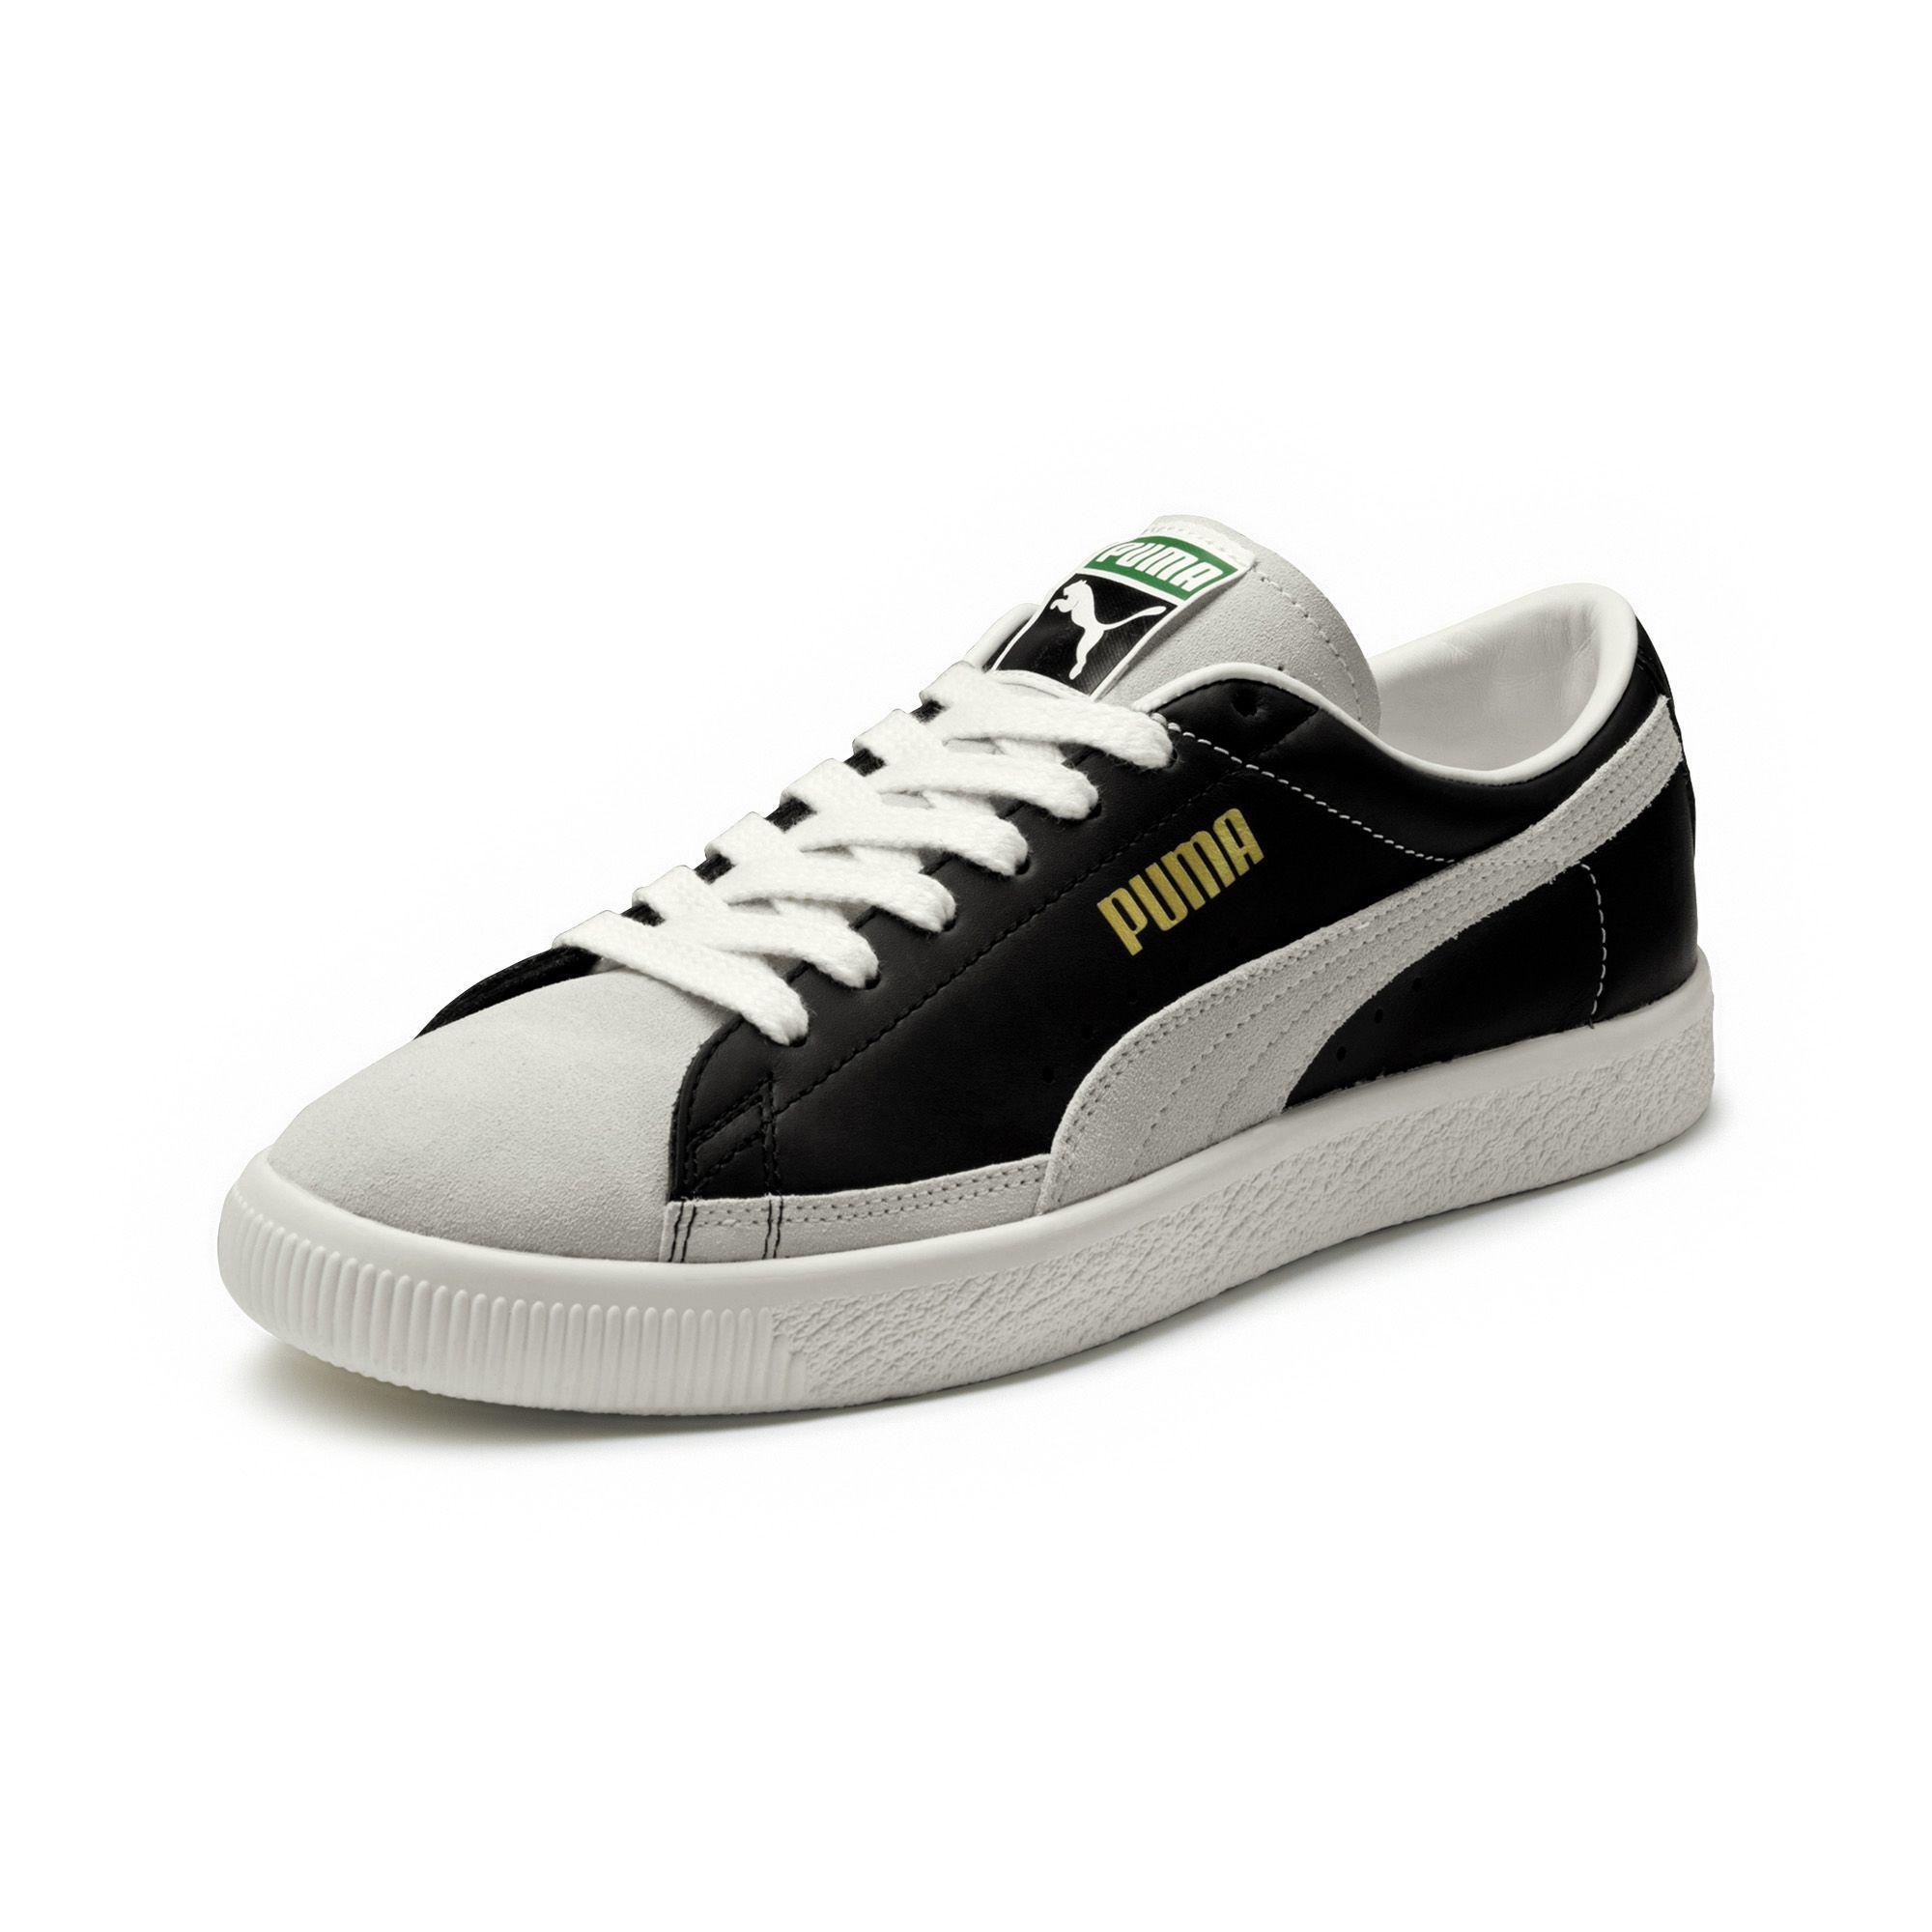 7653dfc79e5 Lyst - PUMA Basket 90680 Sneakers in Black for Men